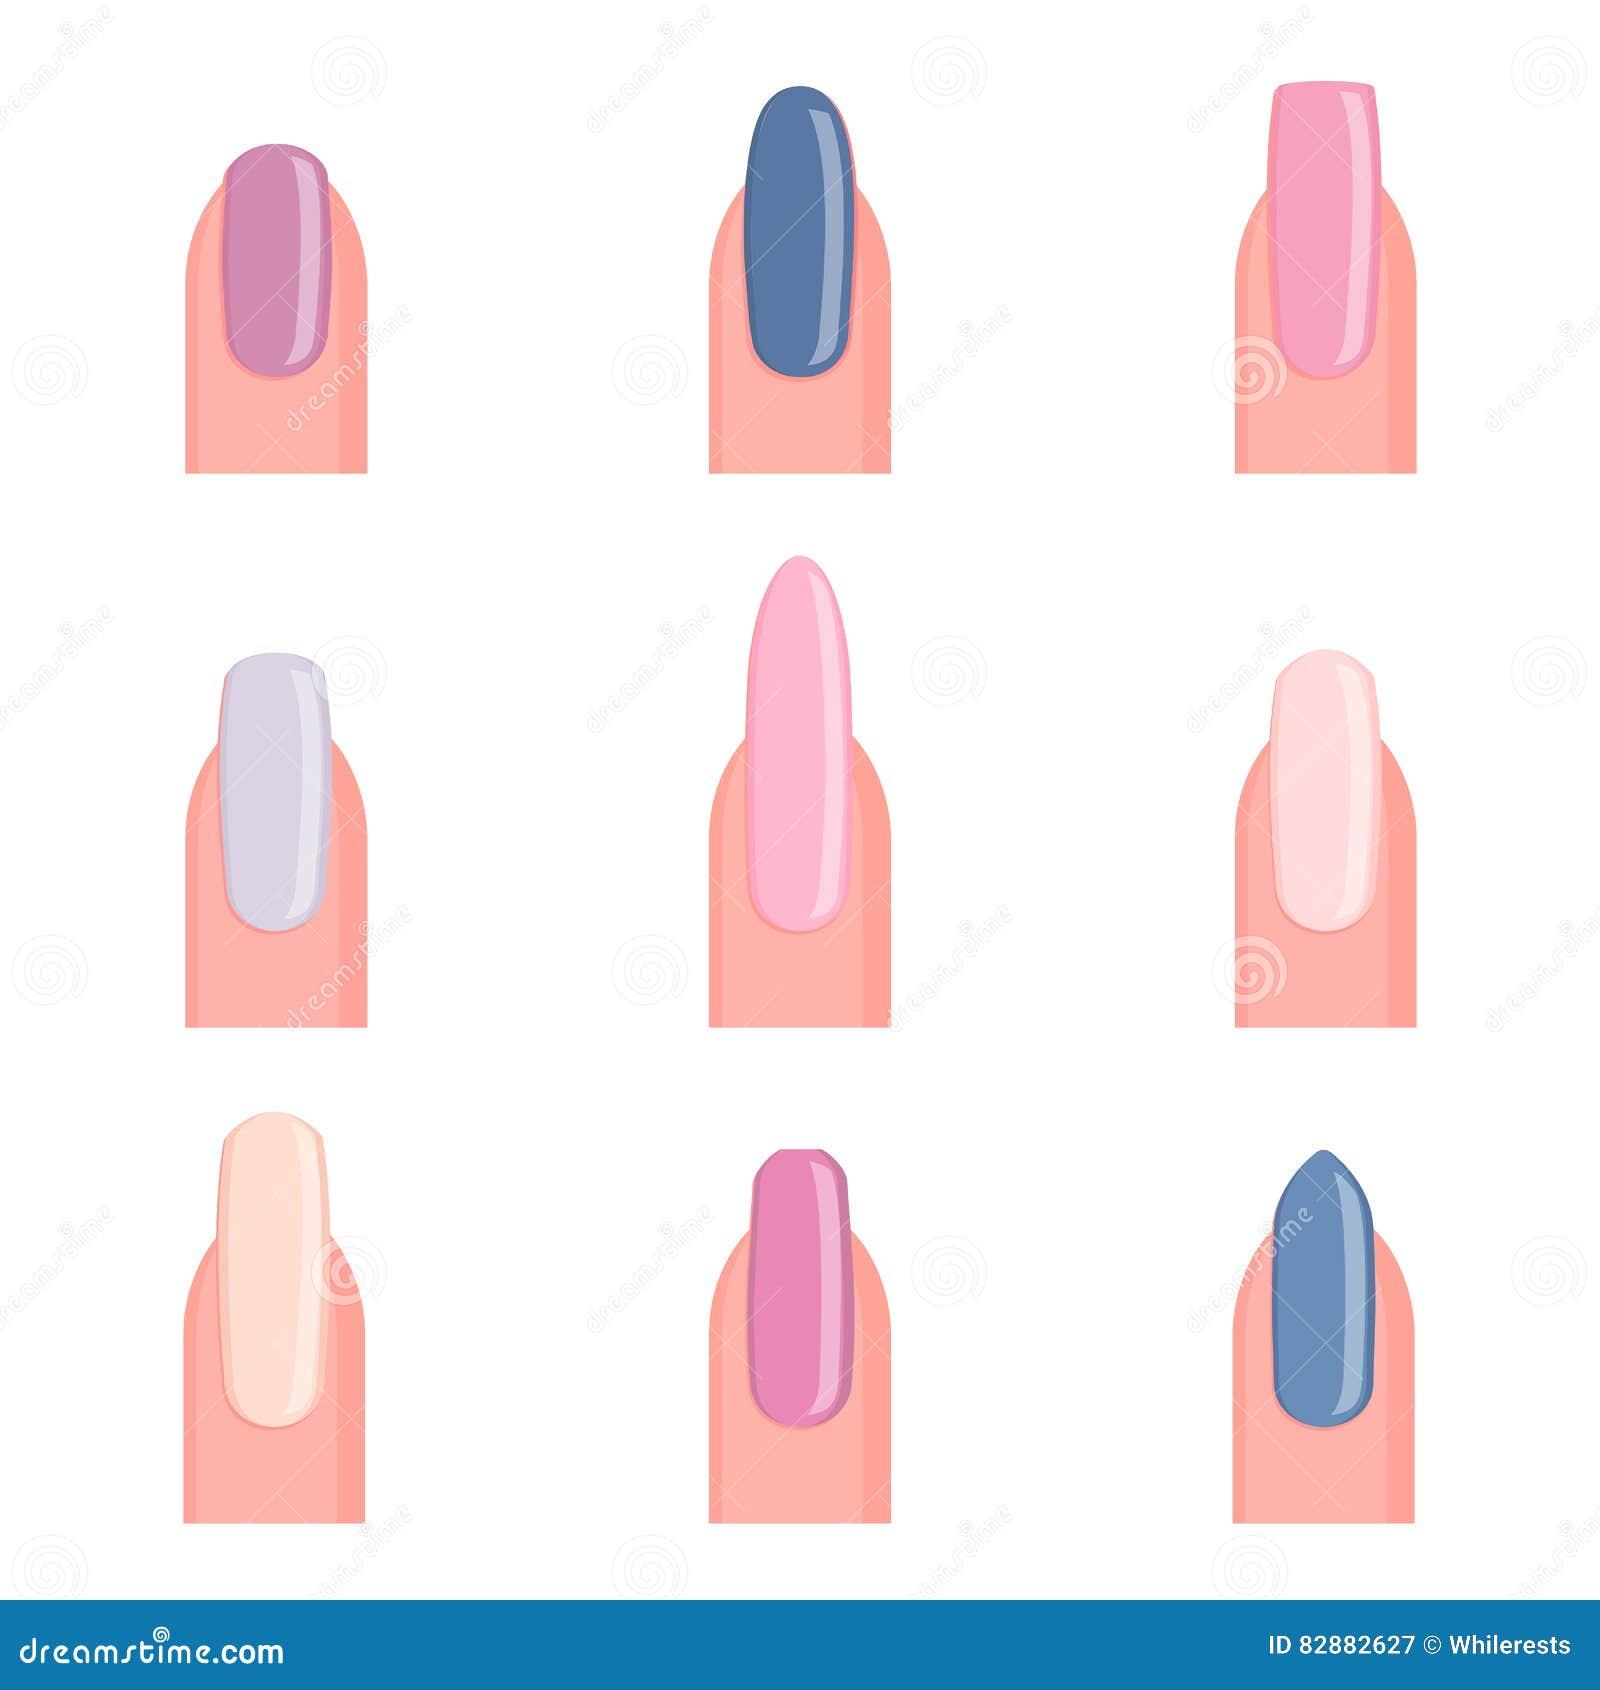 Cara da menina da beleza com verniz para as unhas colorido Estúdio colorido disparado da jovem mulher Cores vívidas Tratamento de